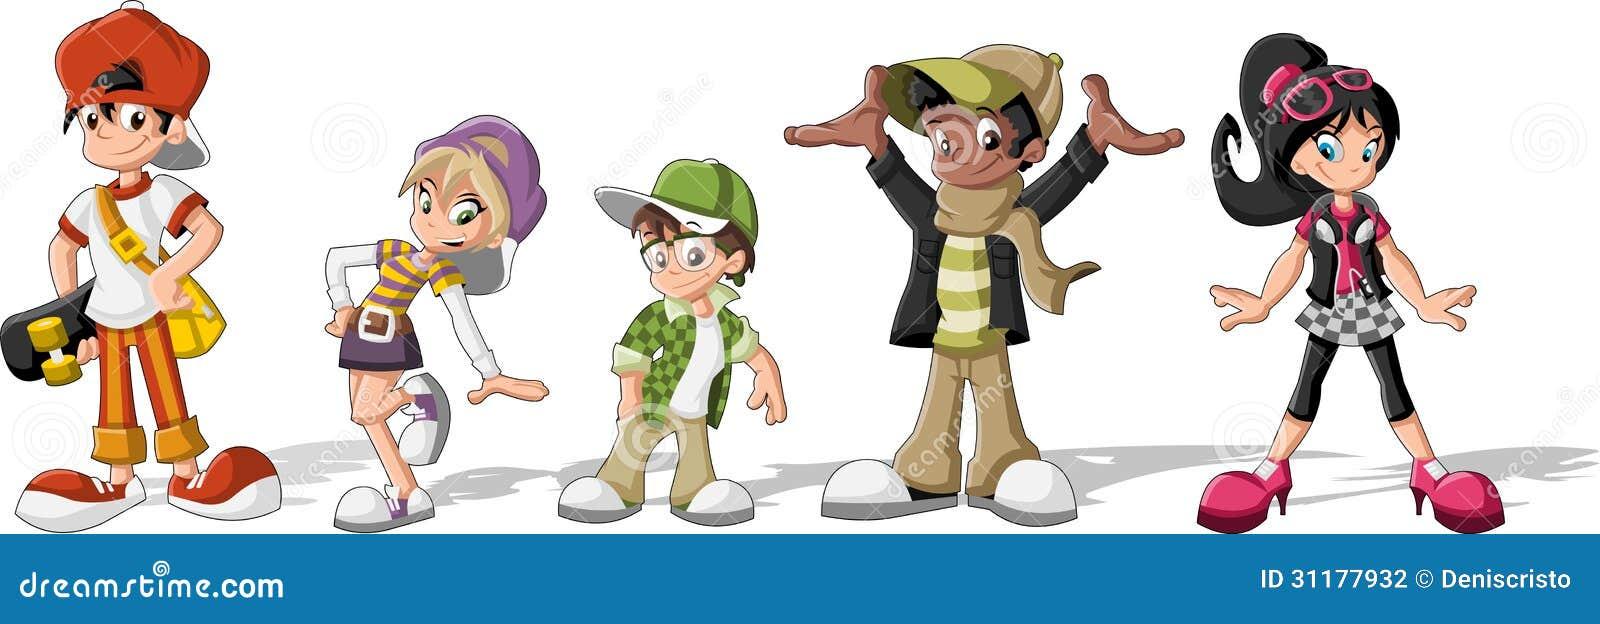 Cartoon Group Of People